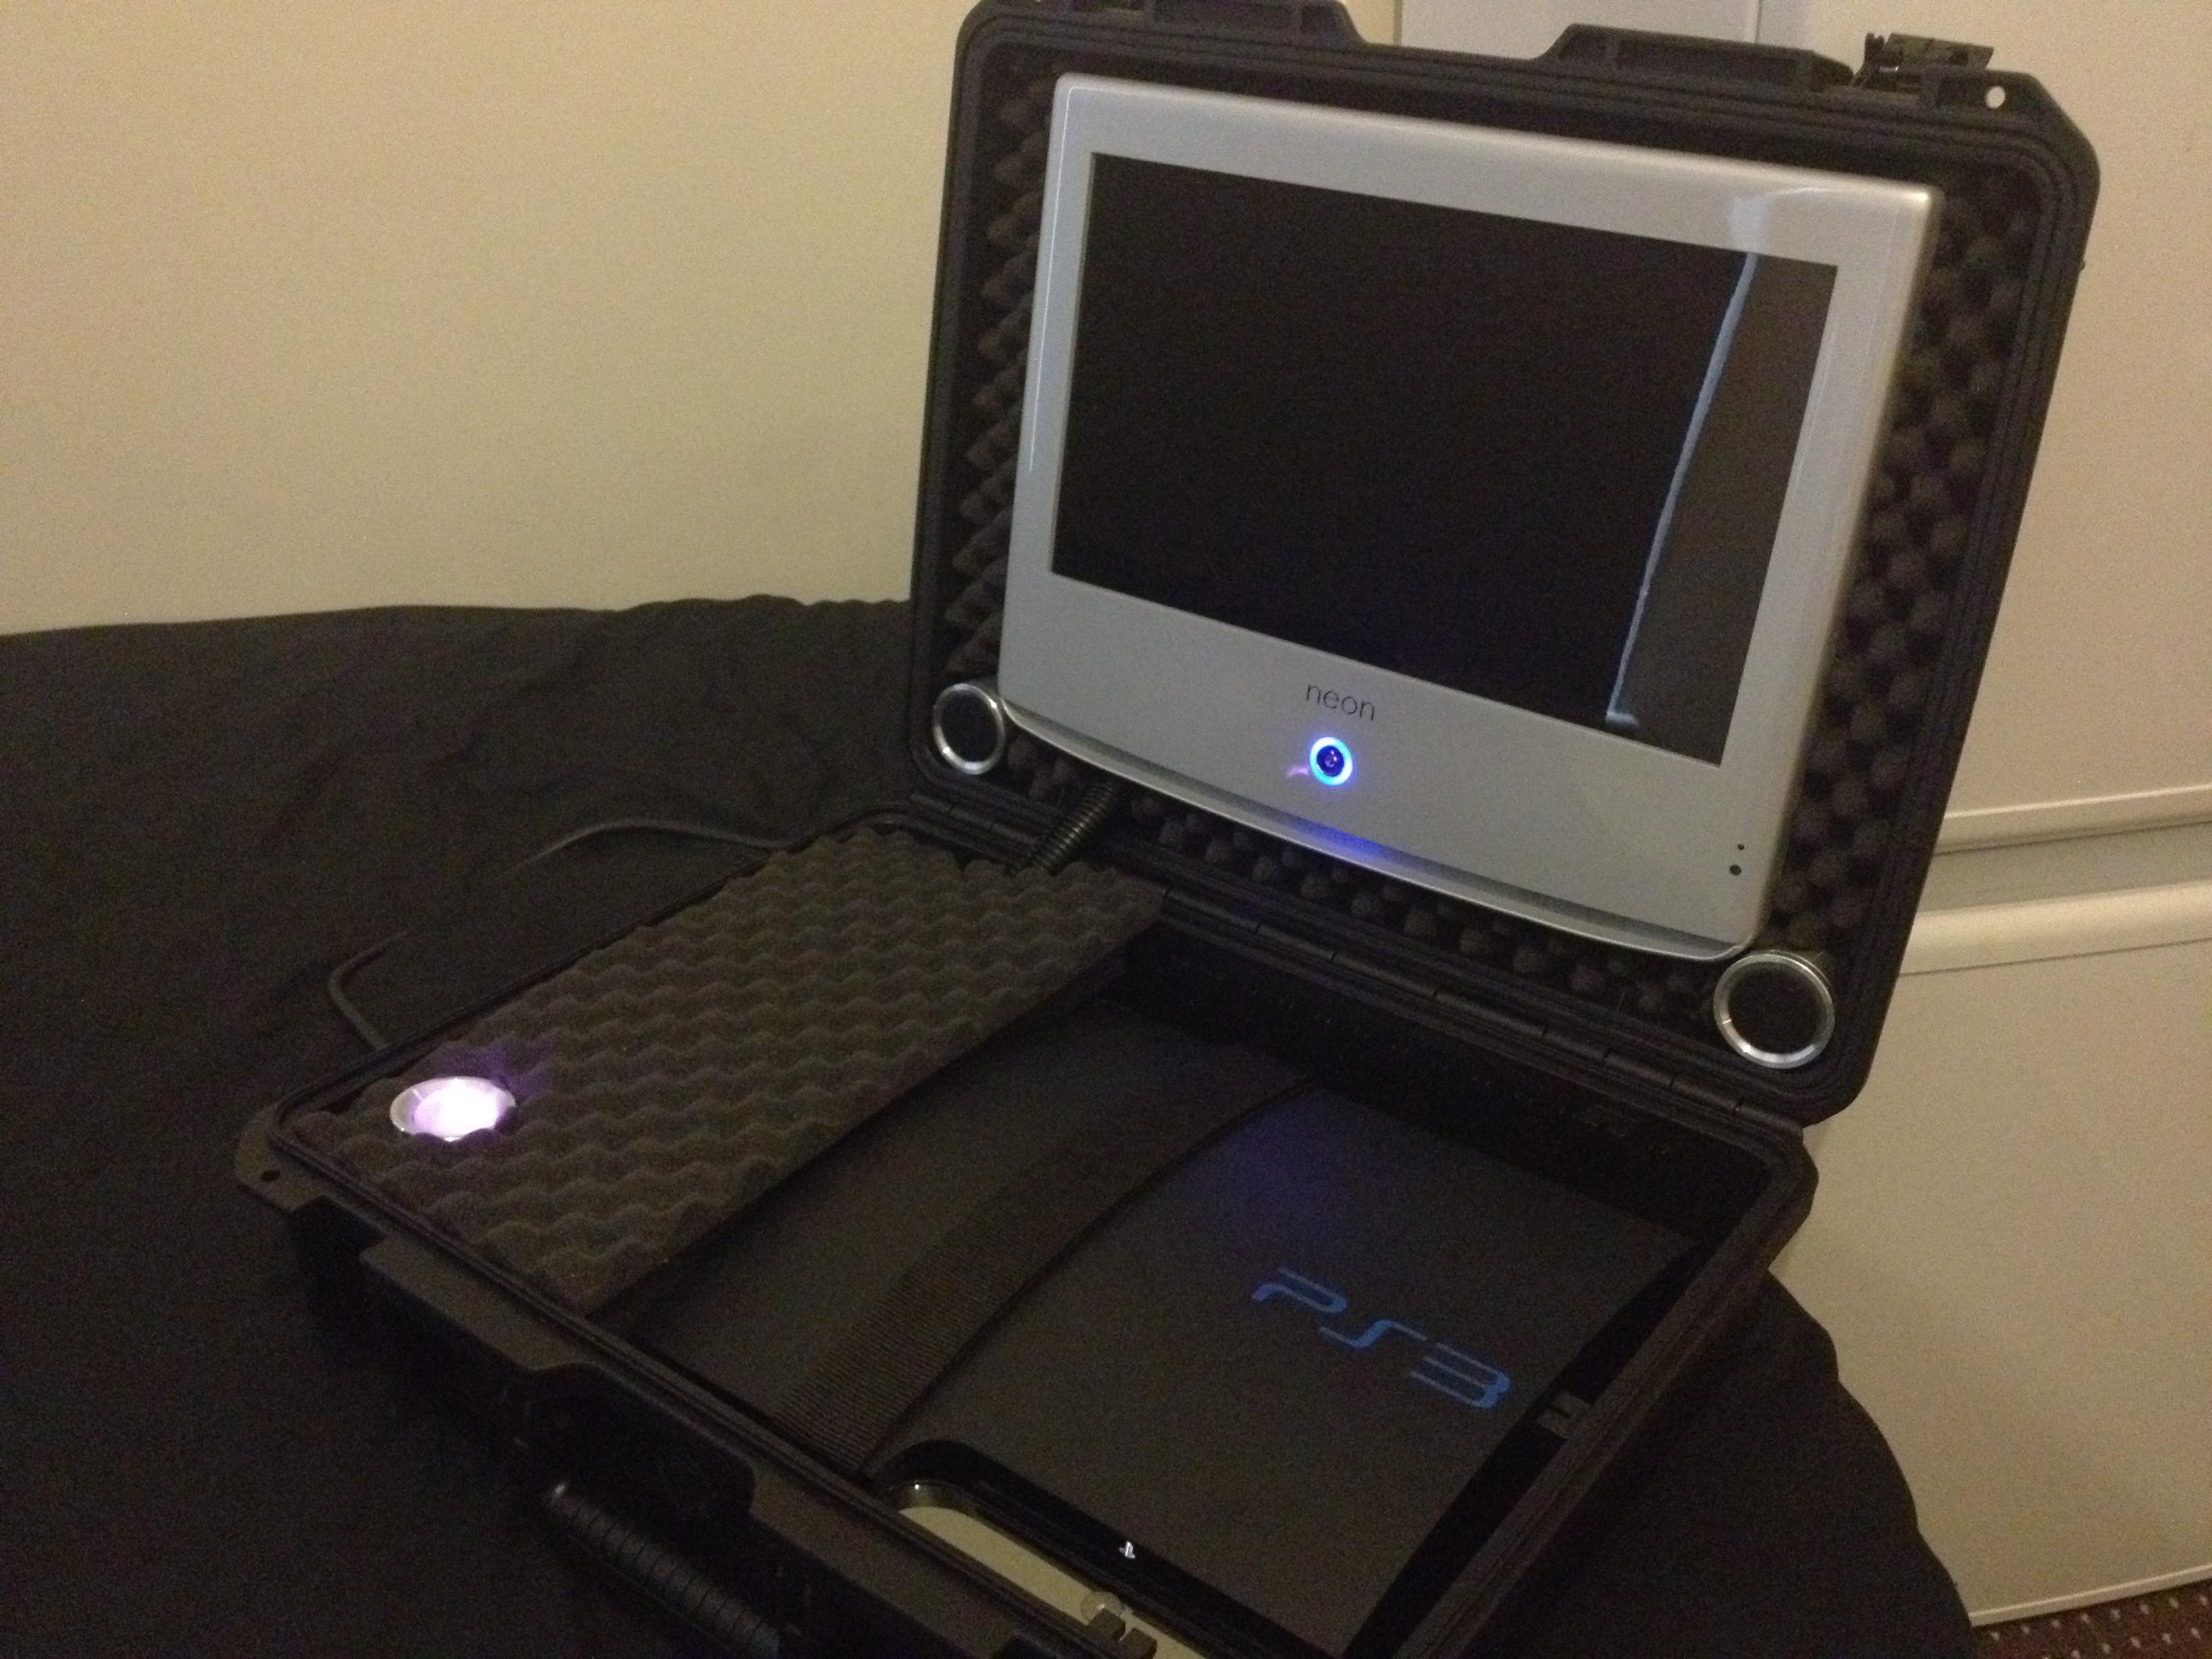 Portable Playstation 3